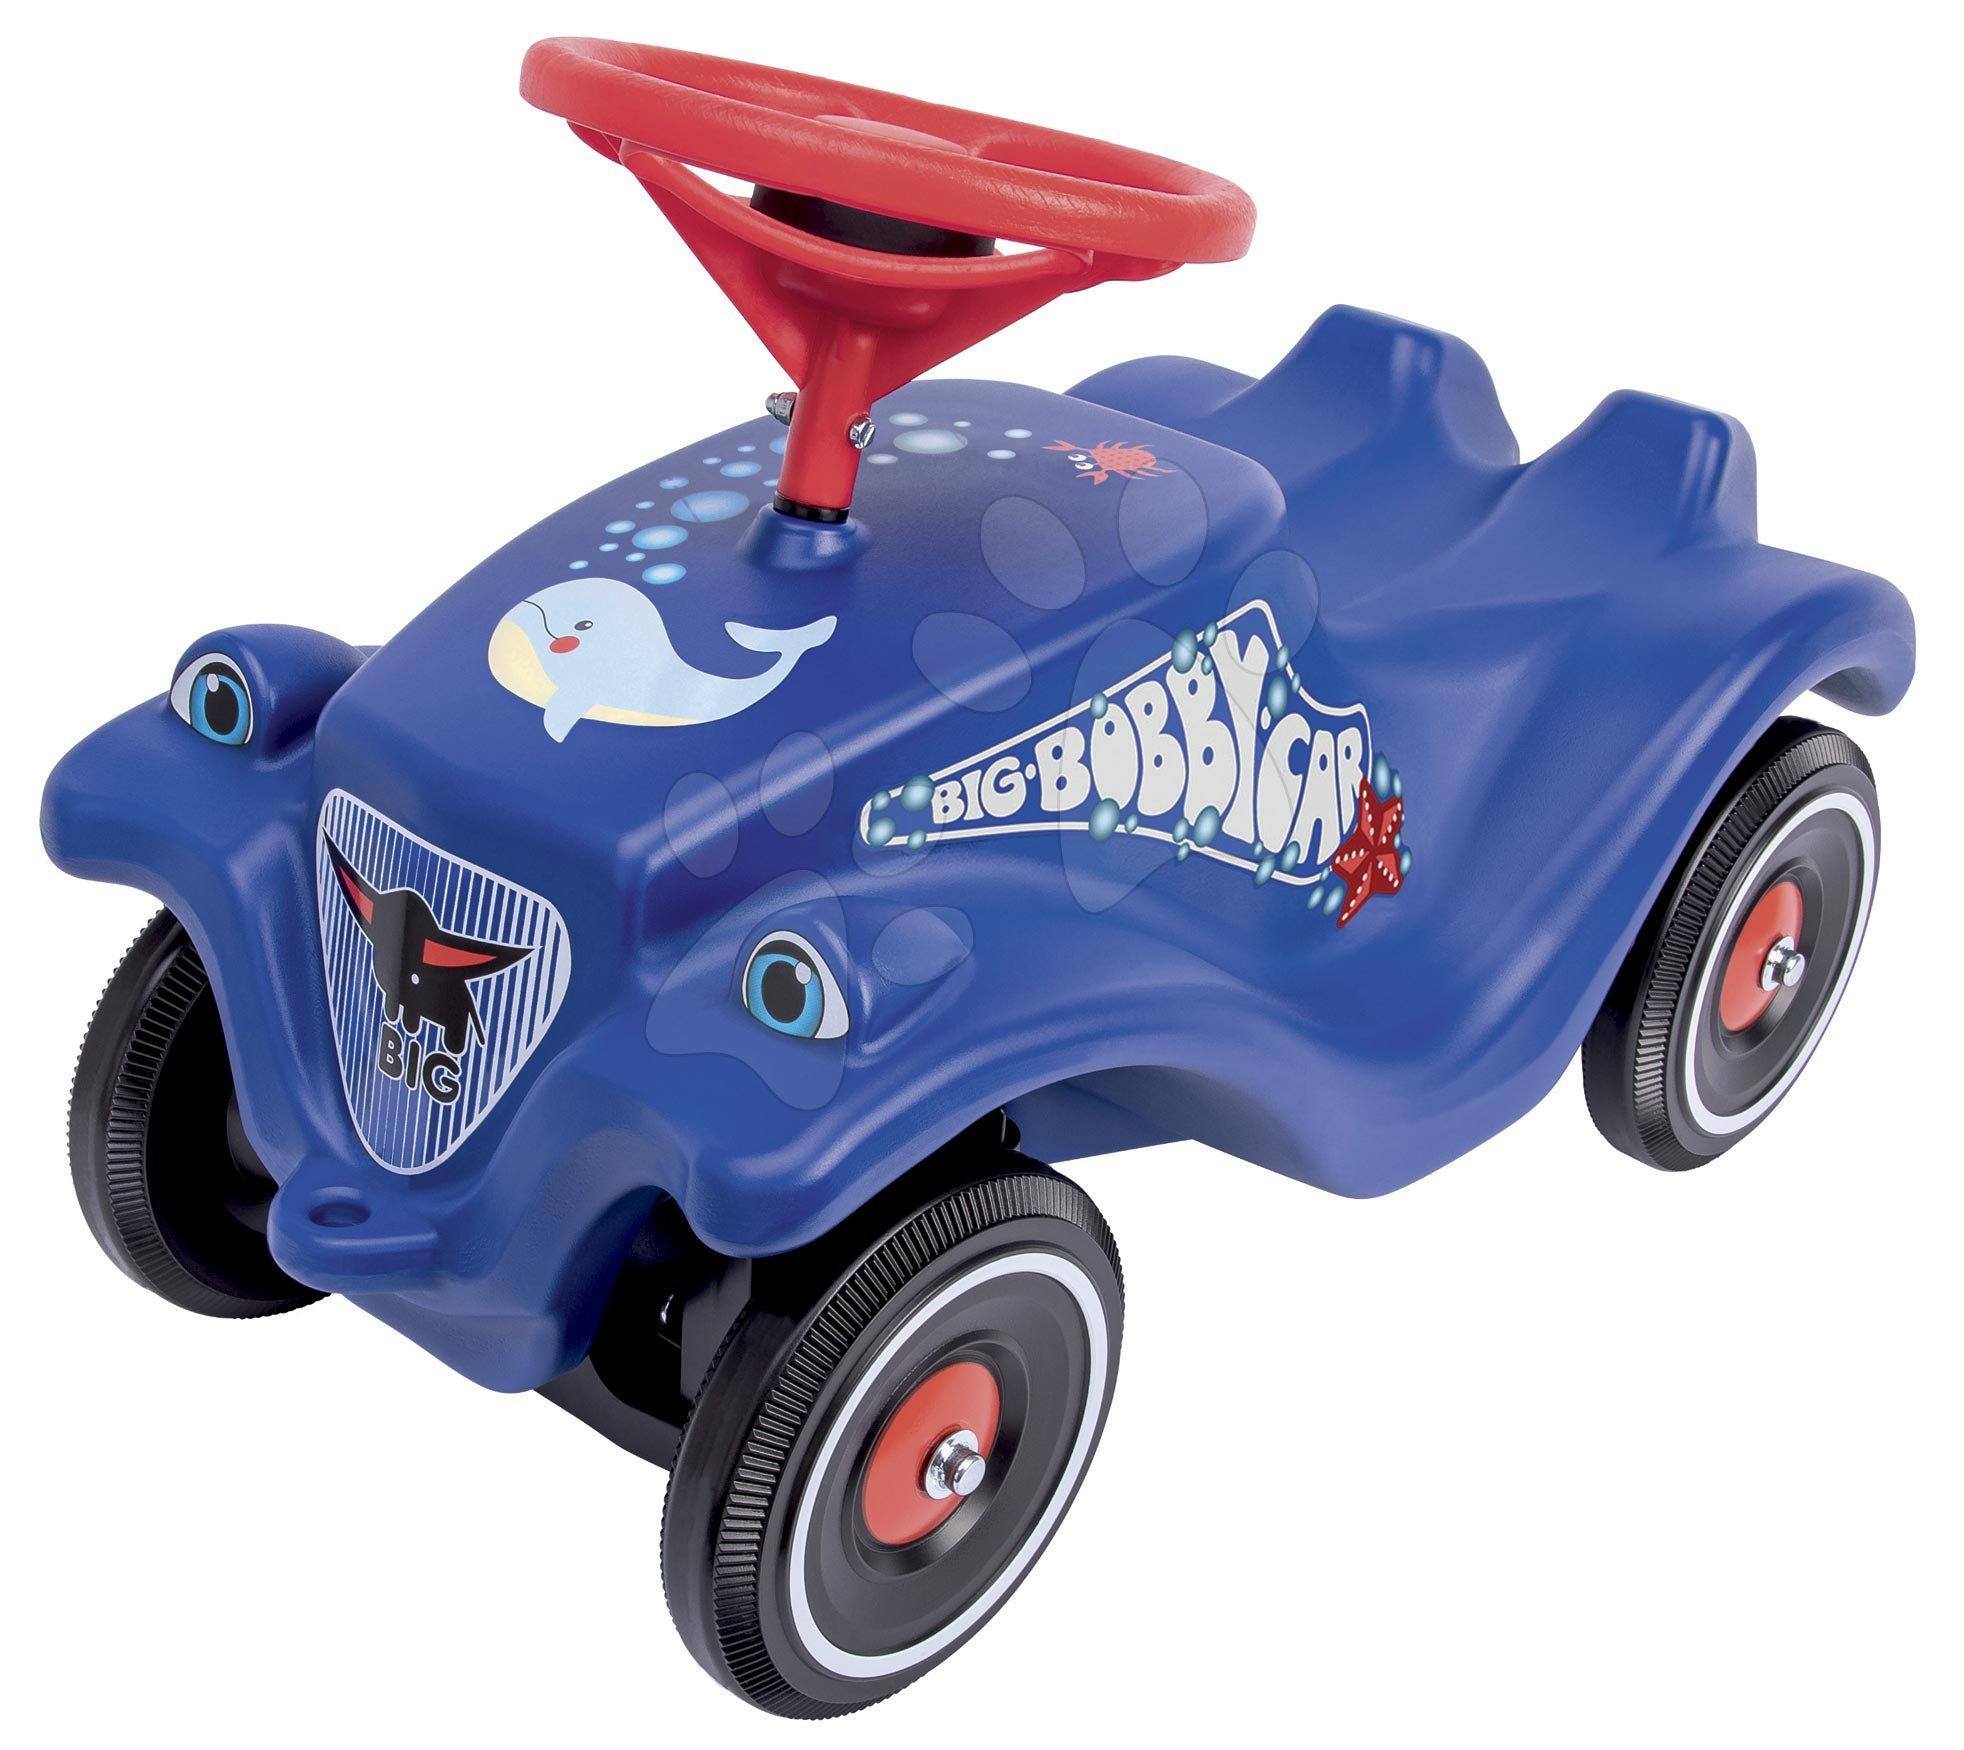 Odrážadlo auto Bobby Car Classic Ocean BIG modré so zvukom a nálepkami mora od 12 mes